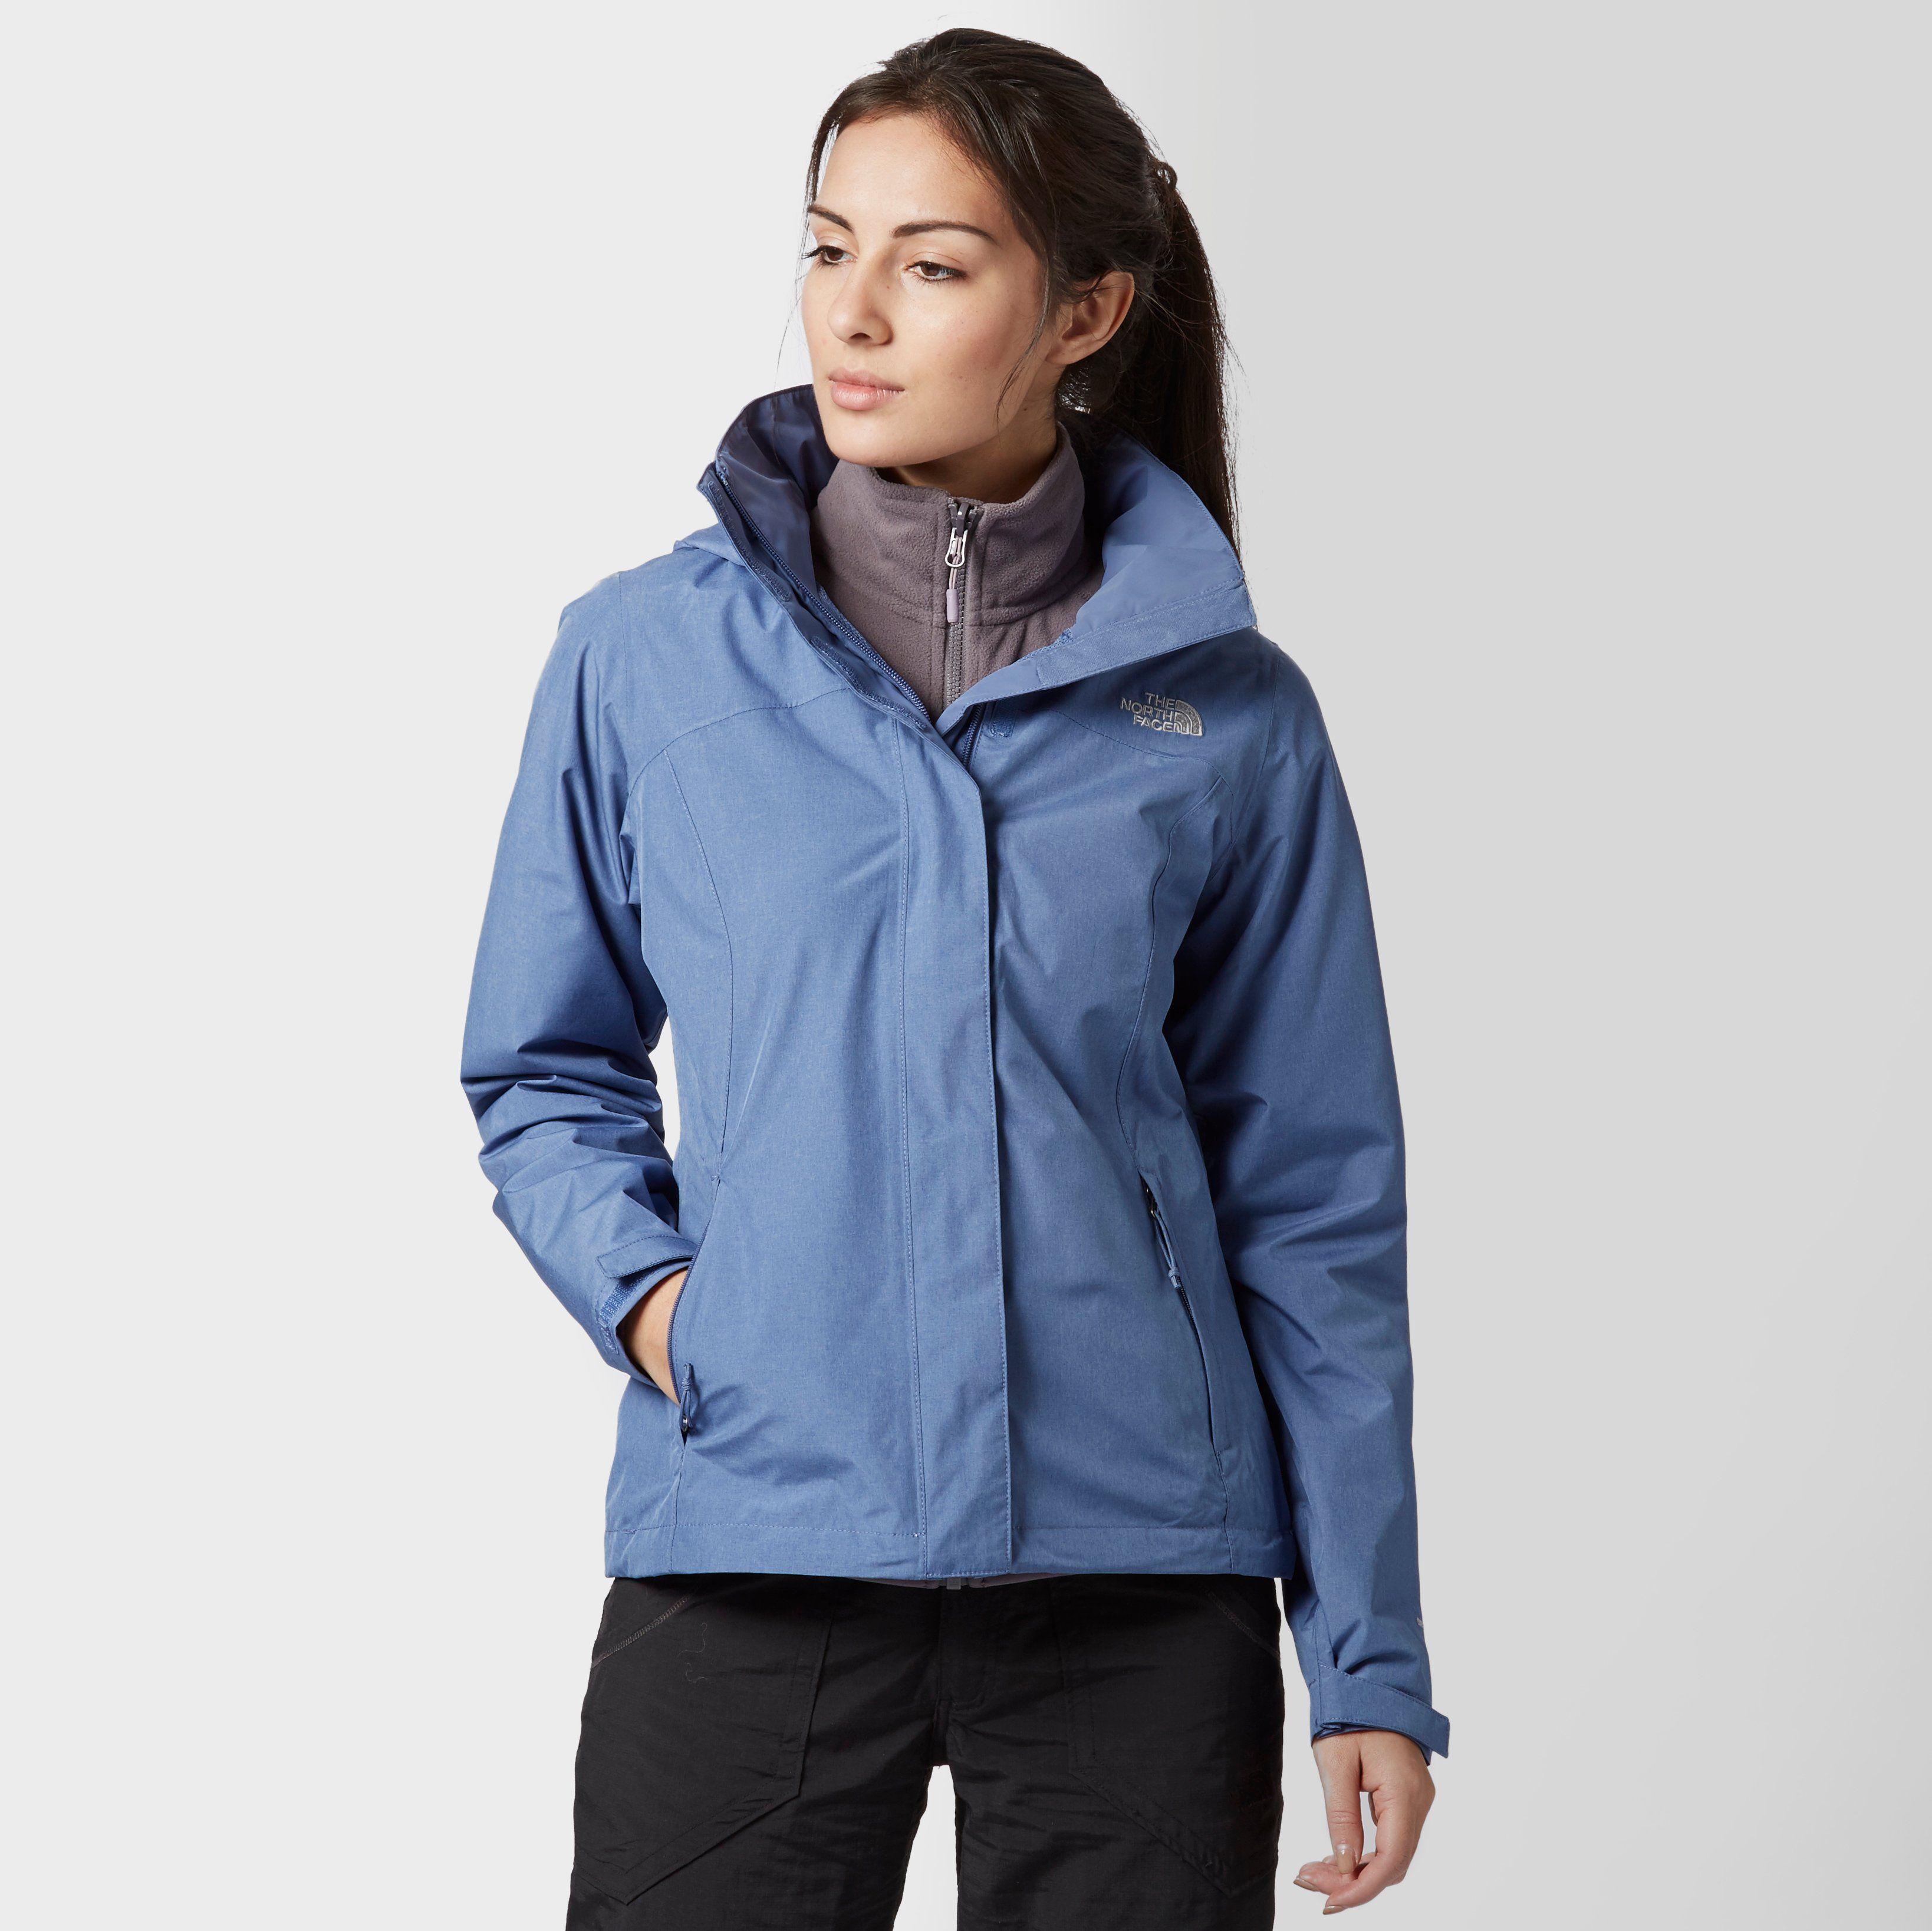 THE NORTH FACE Women's Sangro DryVent™ Waterproof Jacket